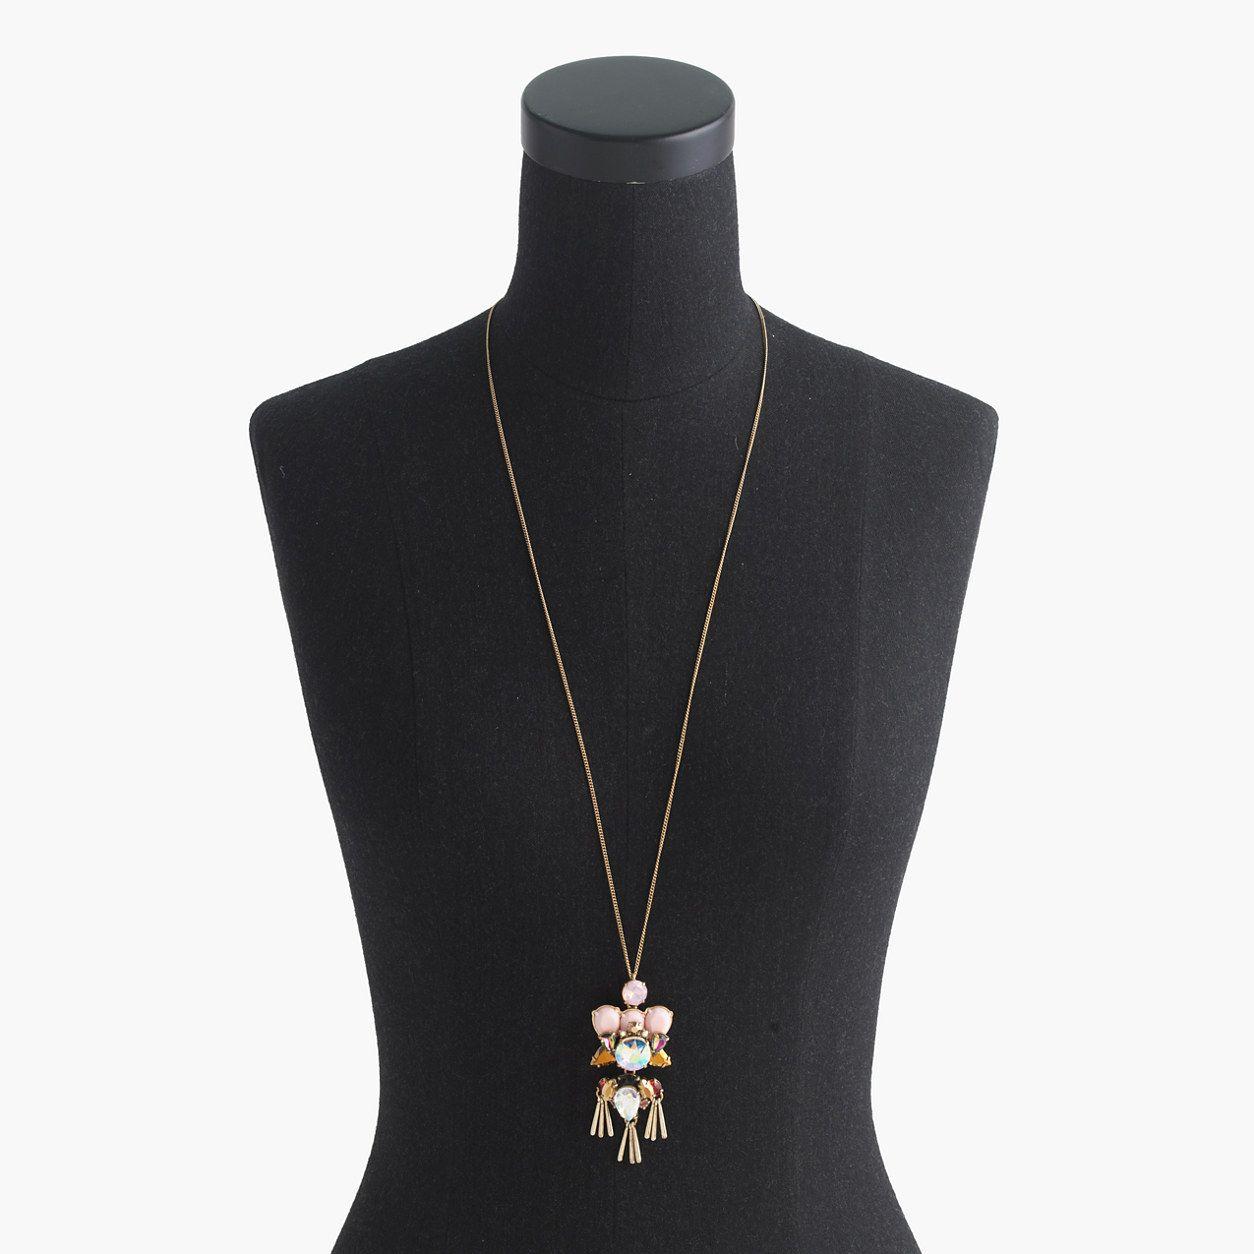 Dragonfly pendant necklace jewelry shop jcrew momowardrobe